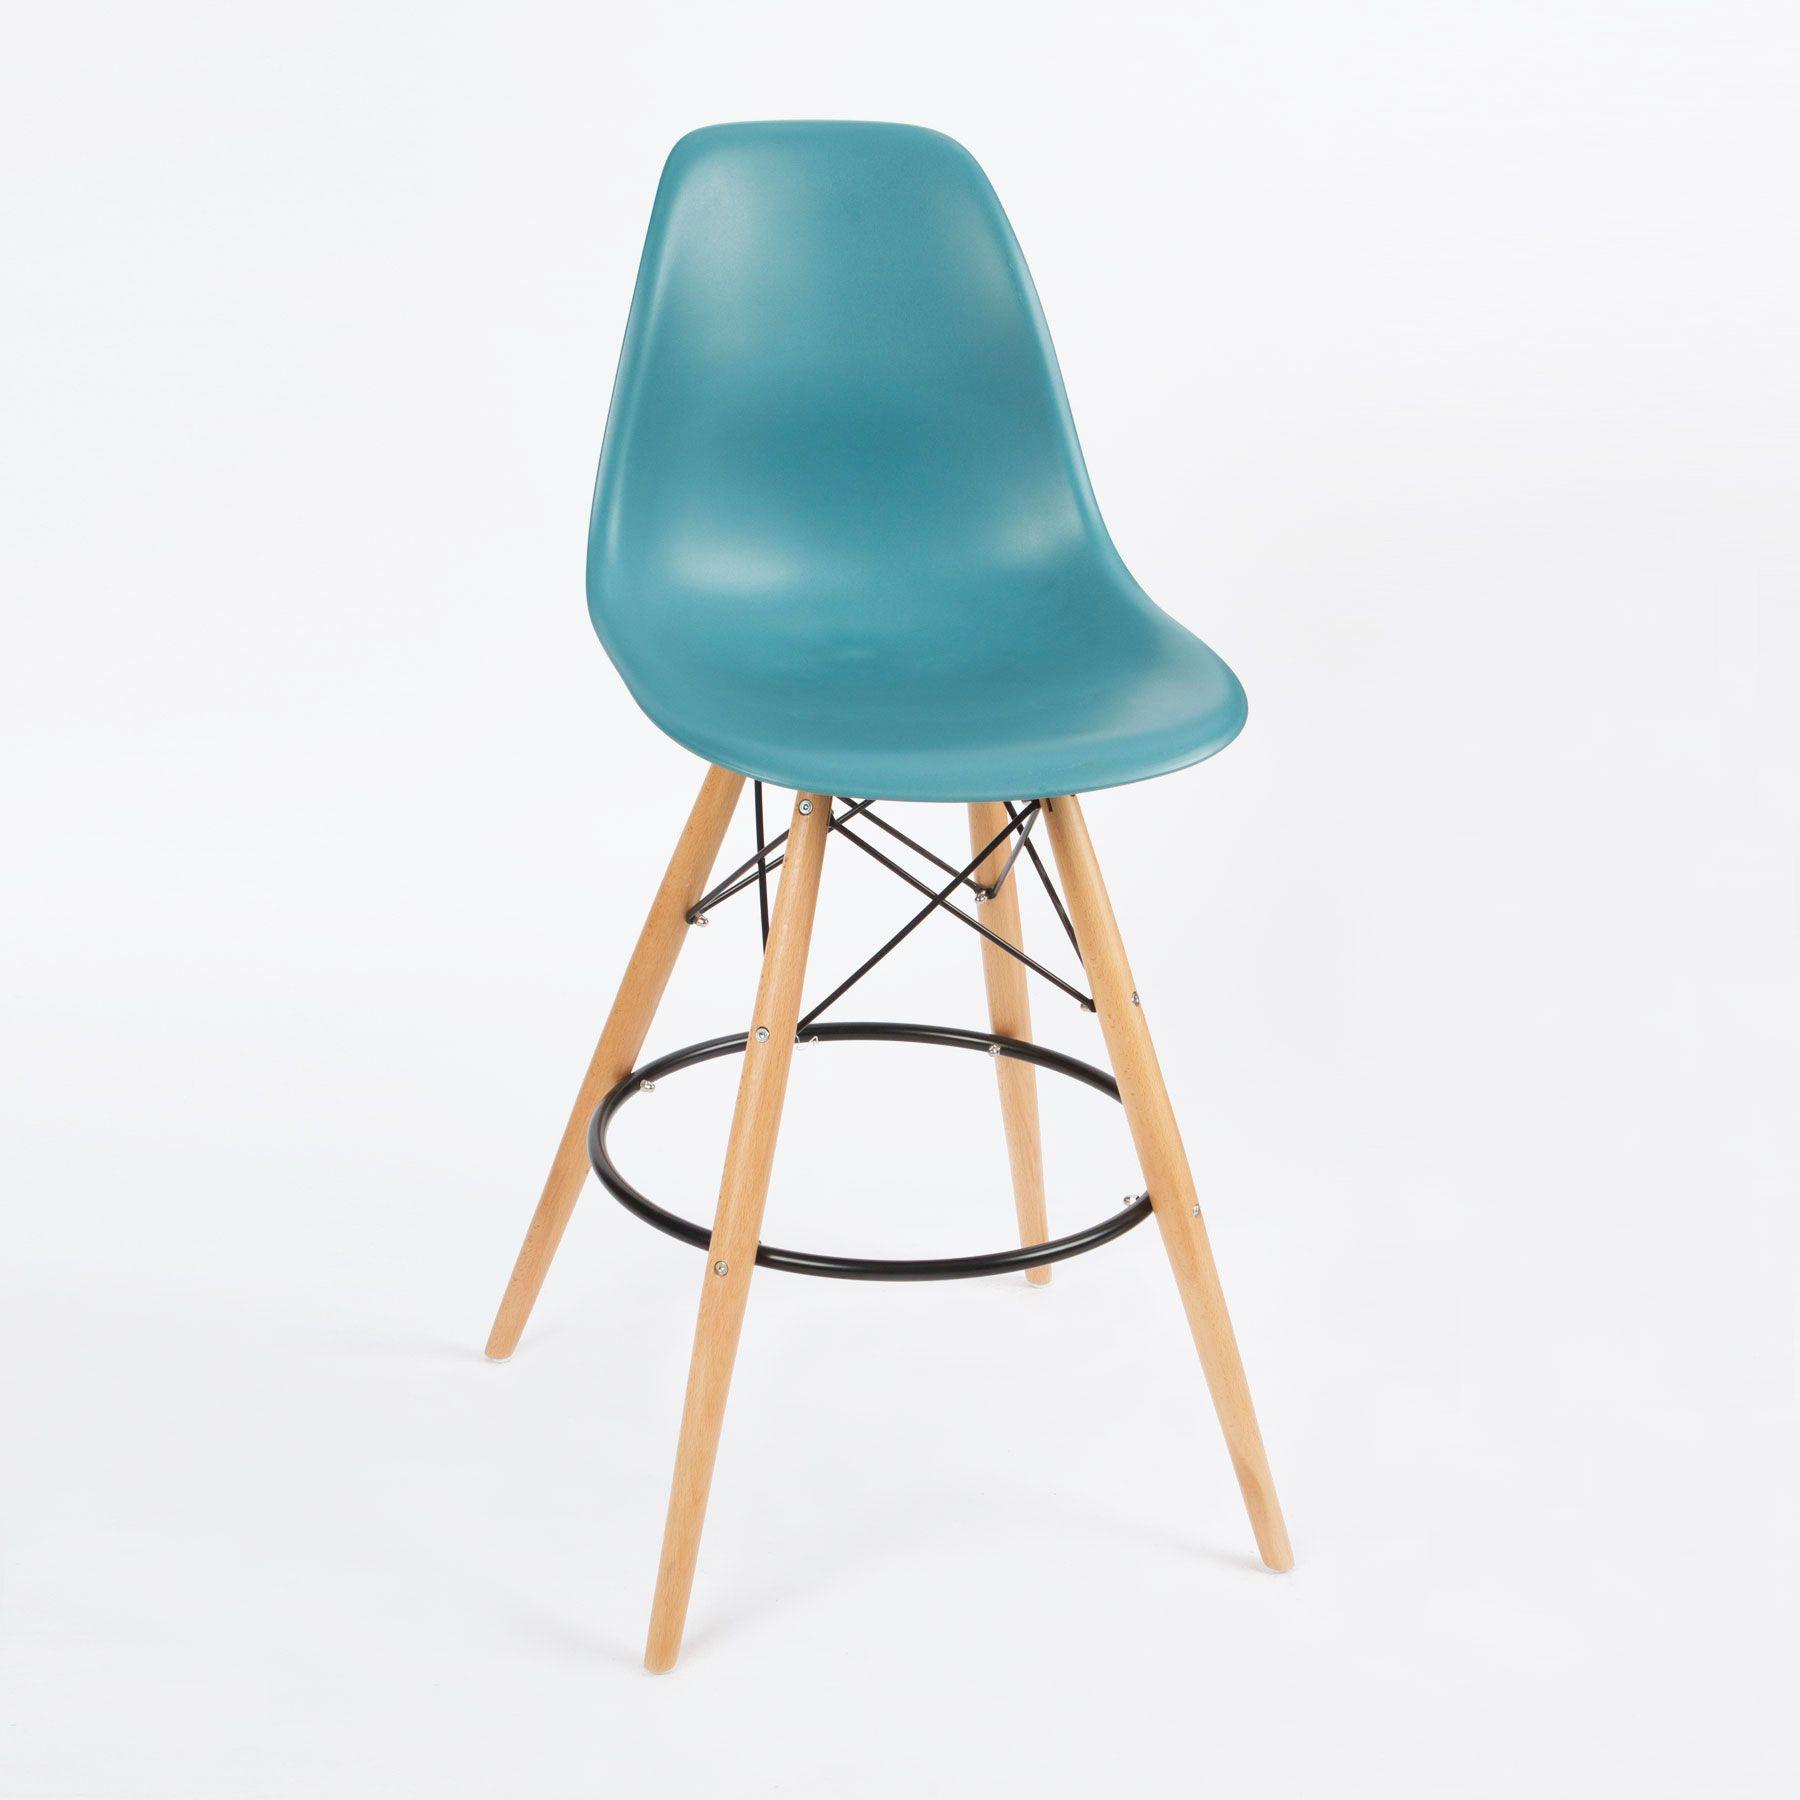 Barstool Slope Chair in Teal | dotandbo.com | Home Idea(ls ...